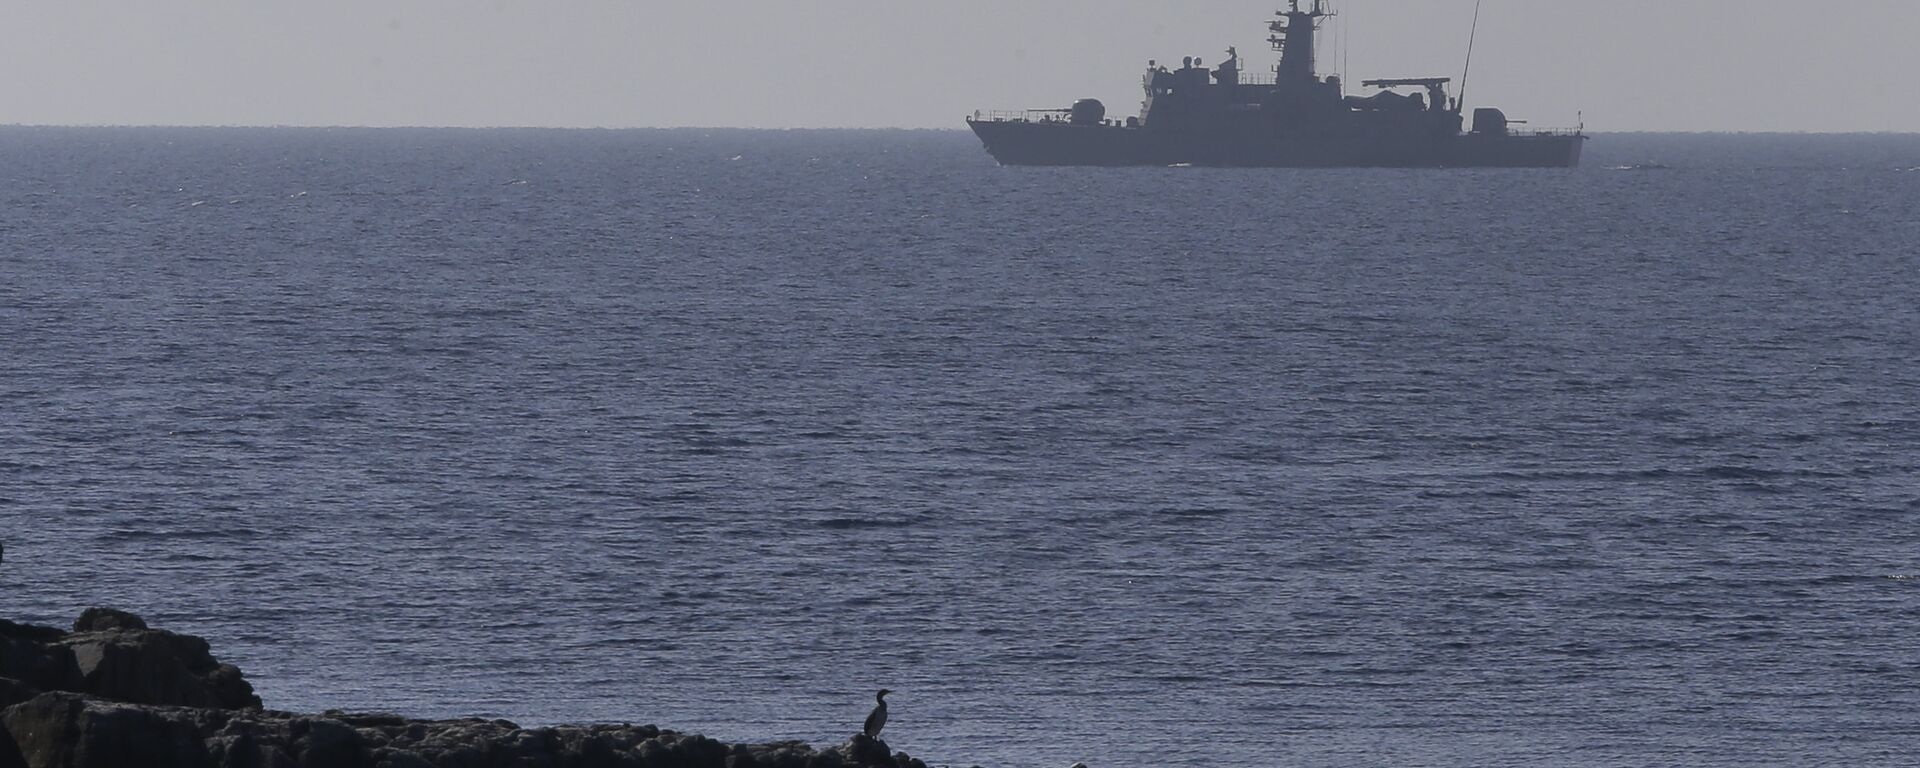 A Greek Navy warship patrols near the eastern Greek Island of Agathonisi and the nearby Turkish shores, on the Aegean Sea (File) - Sputnik International, 1920, 28.08.2021